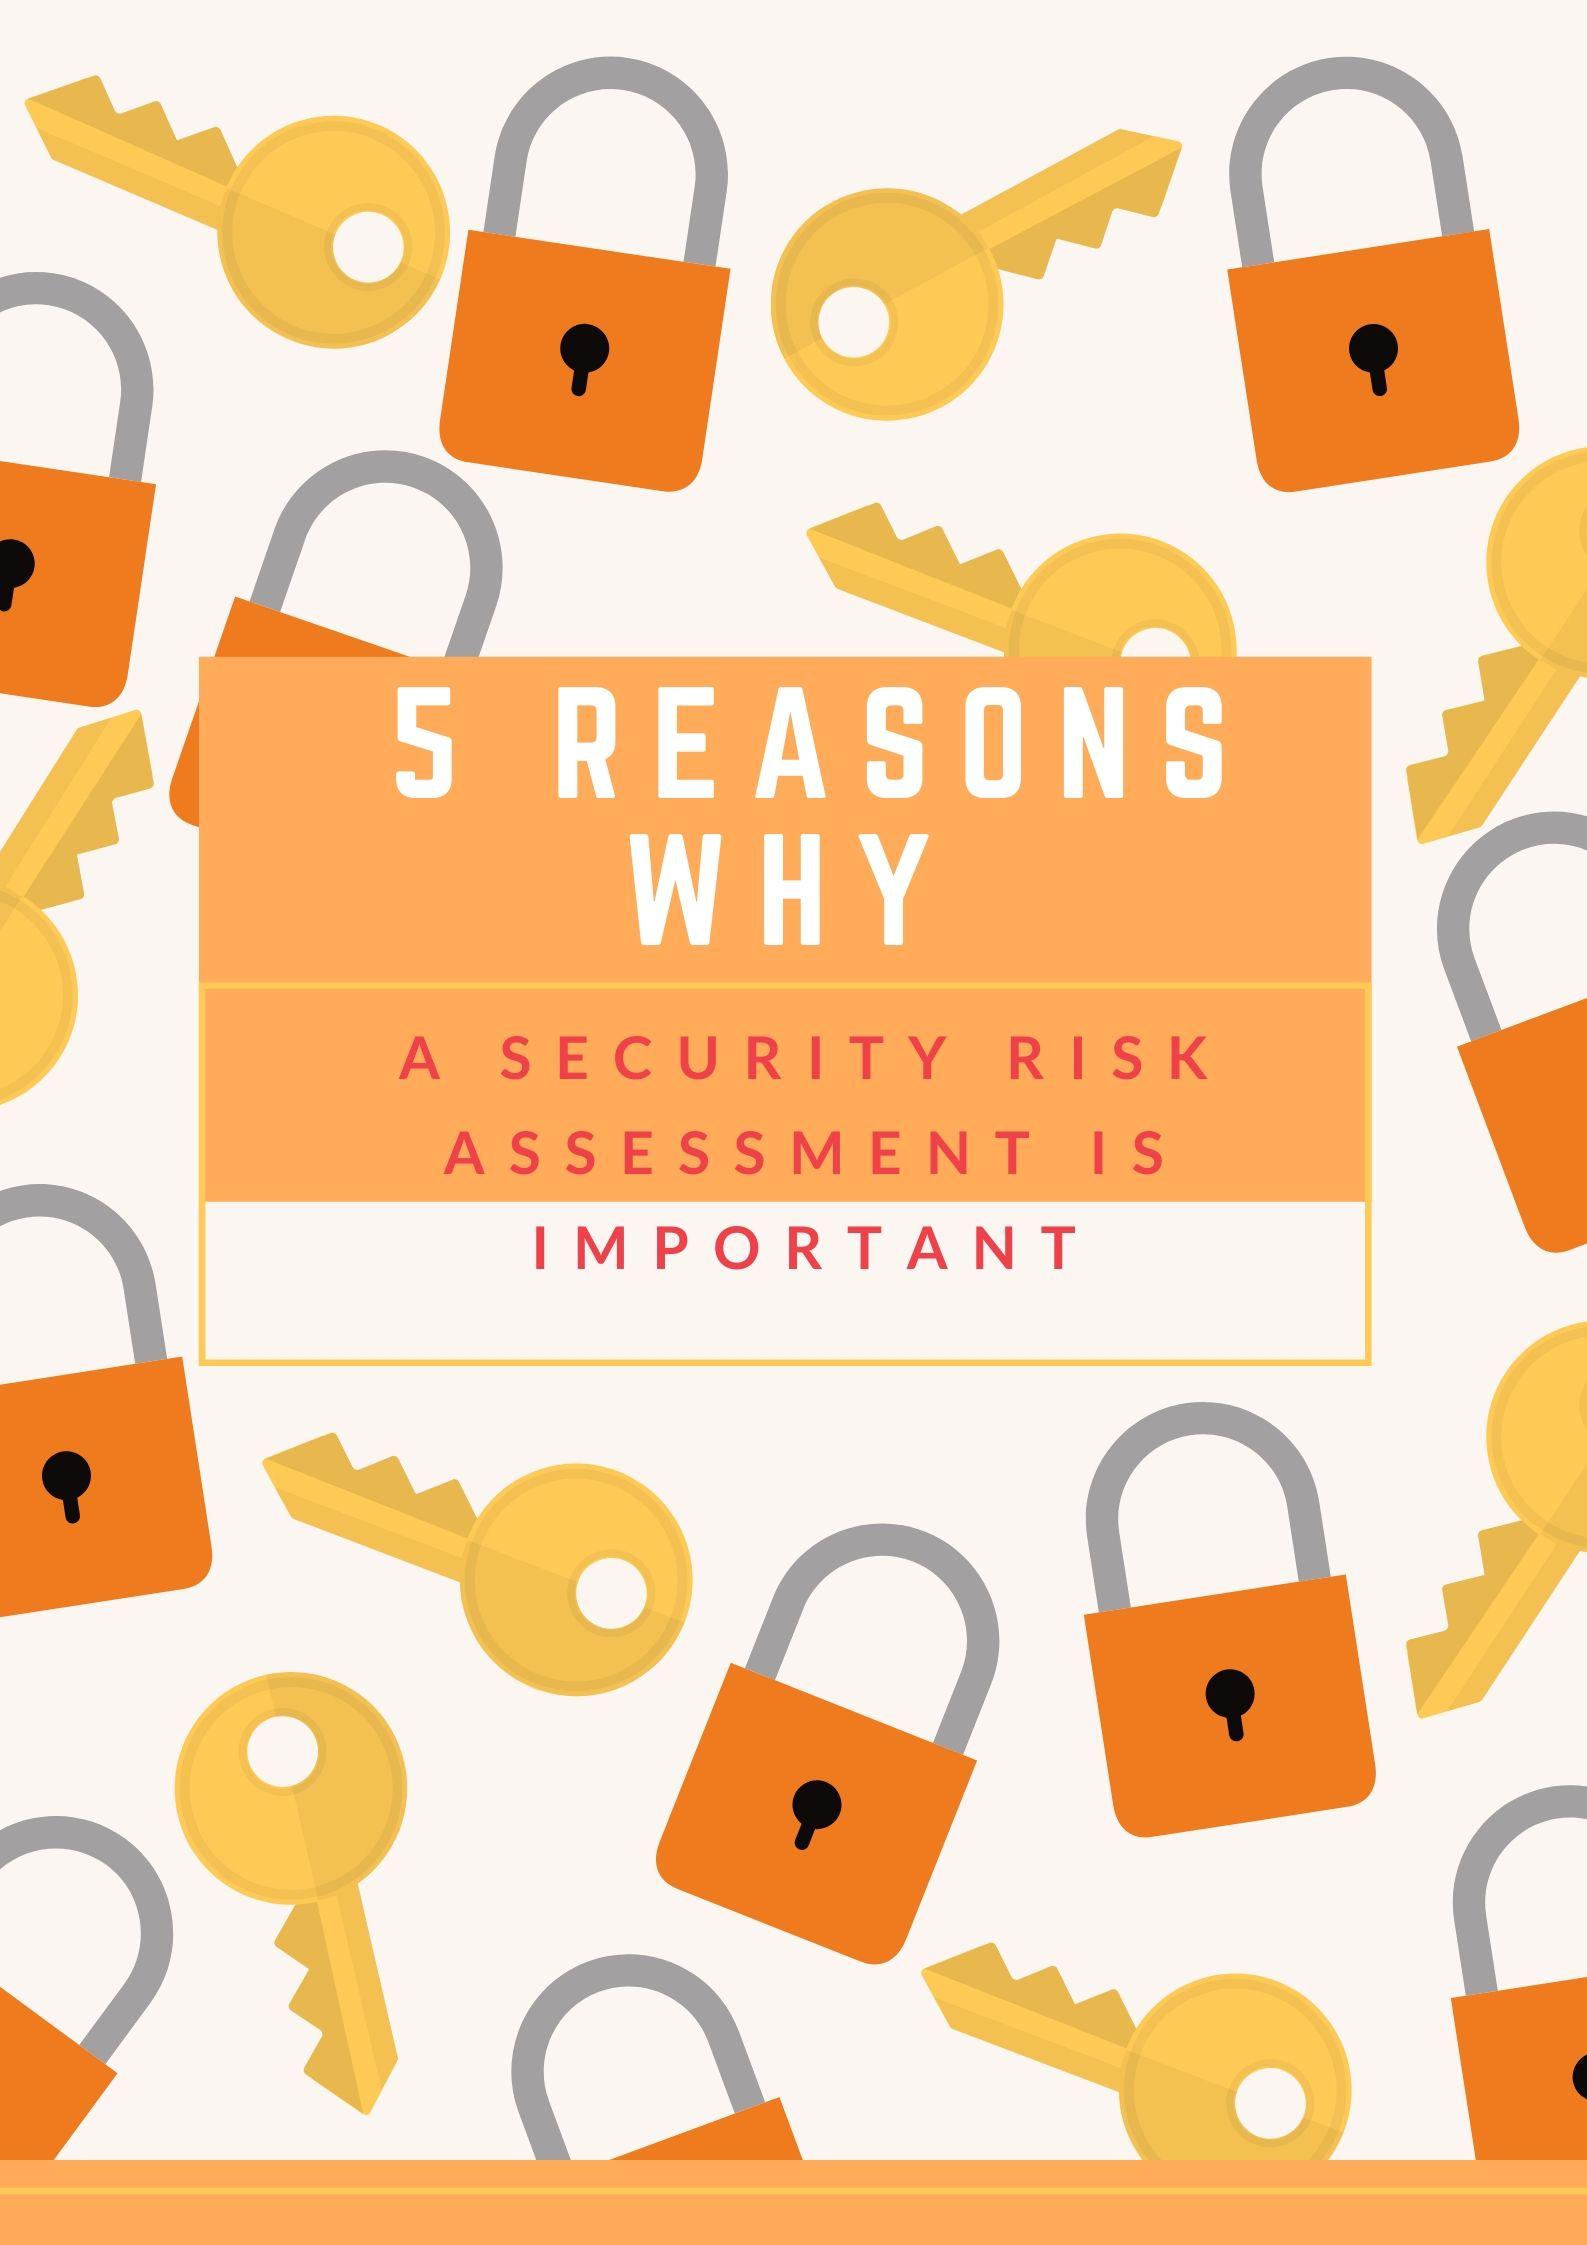 security risk assessment